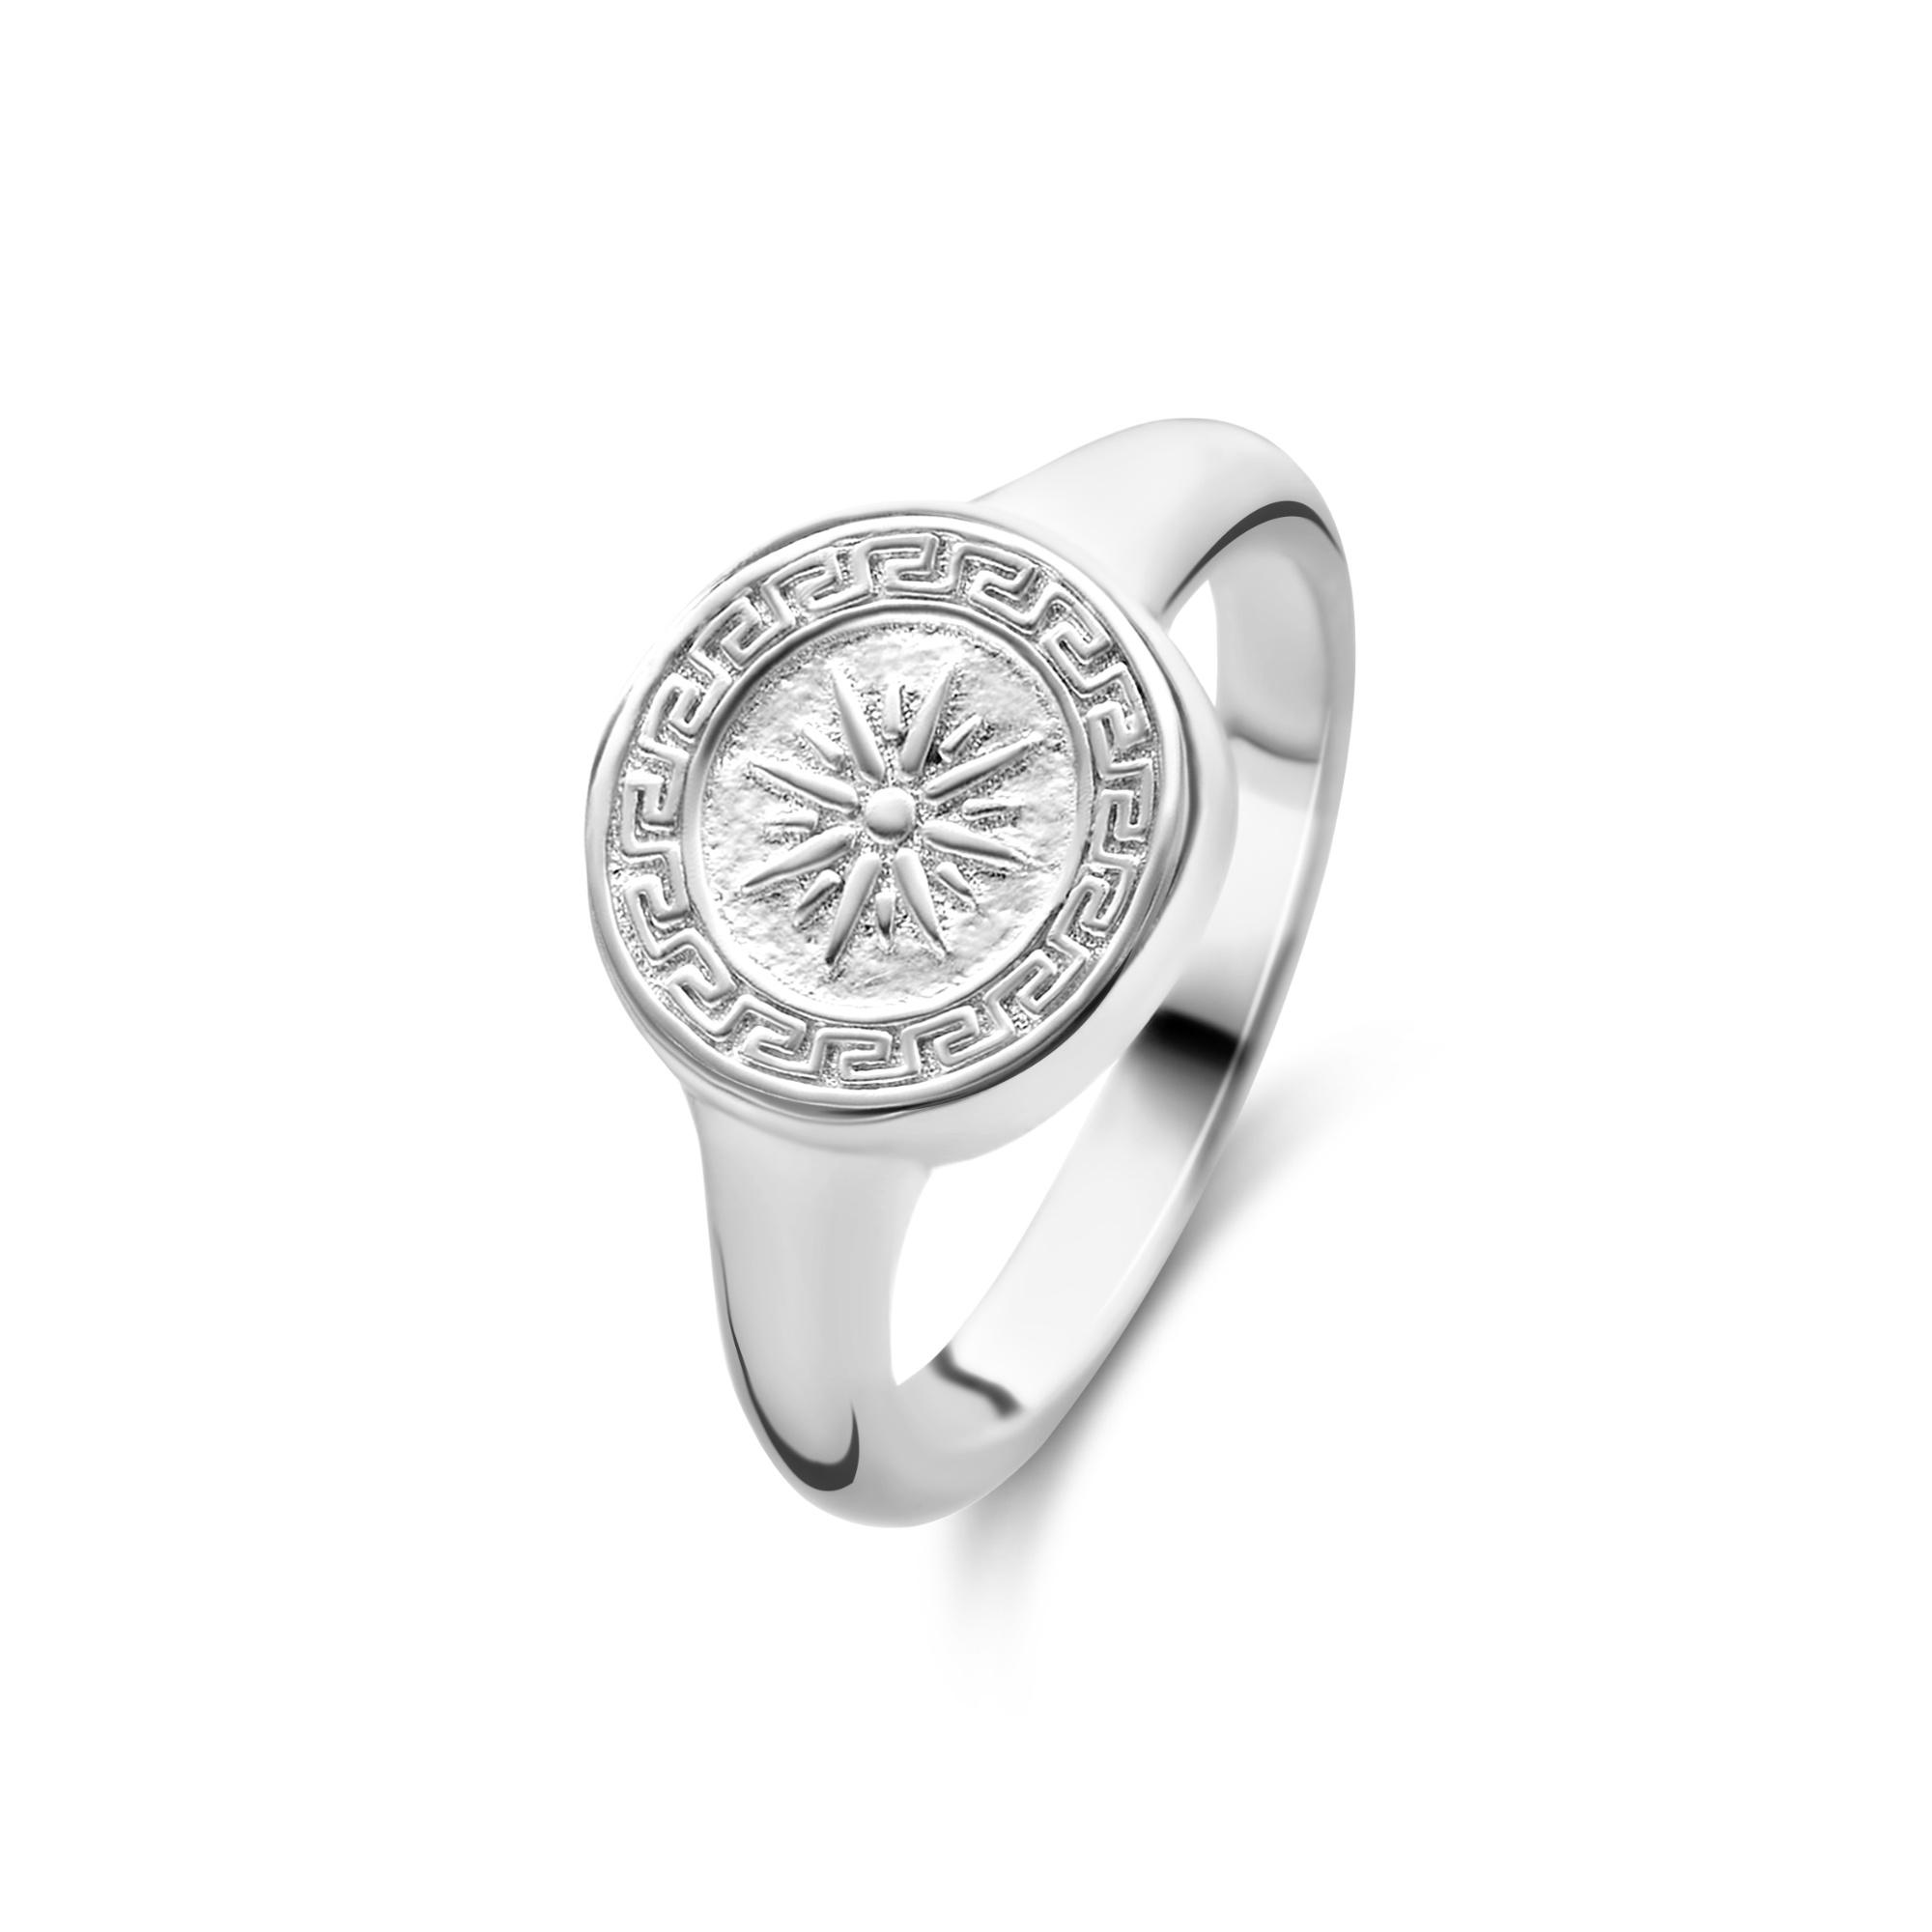 Violet Hamden Athens anello in argento sterling 925